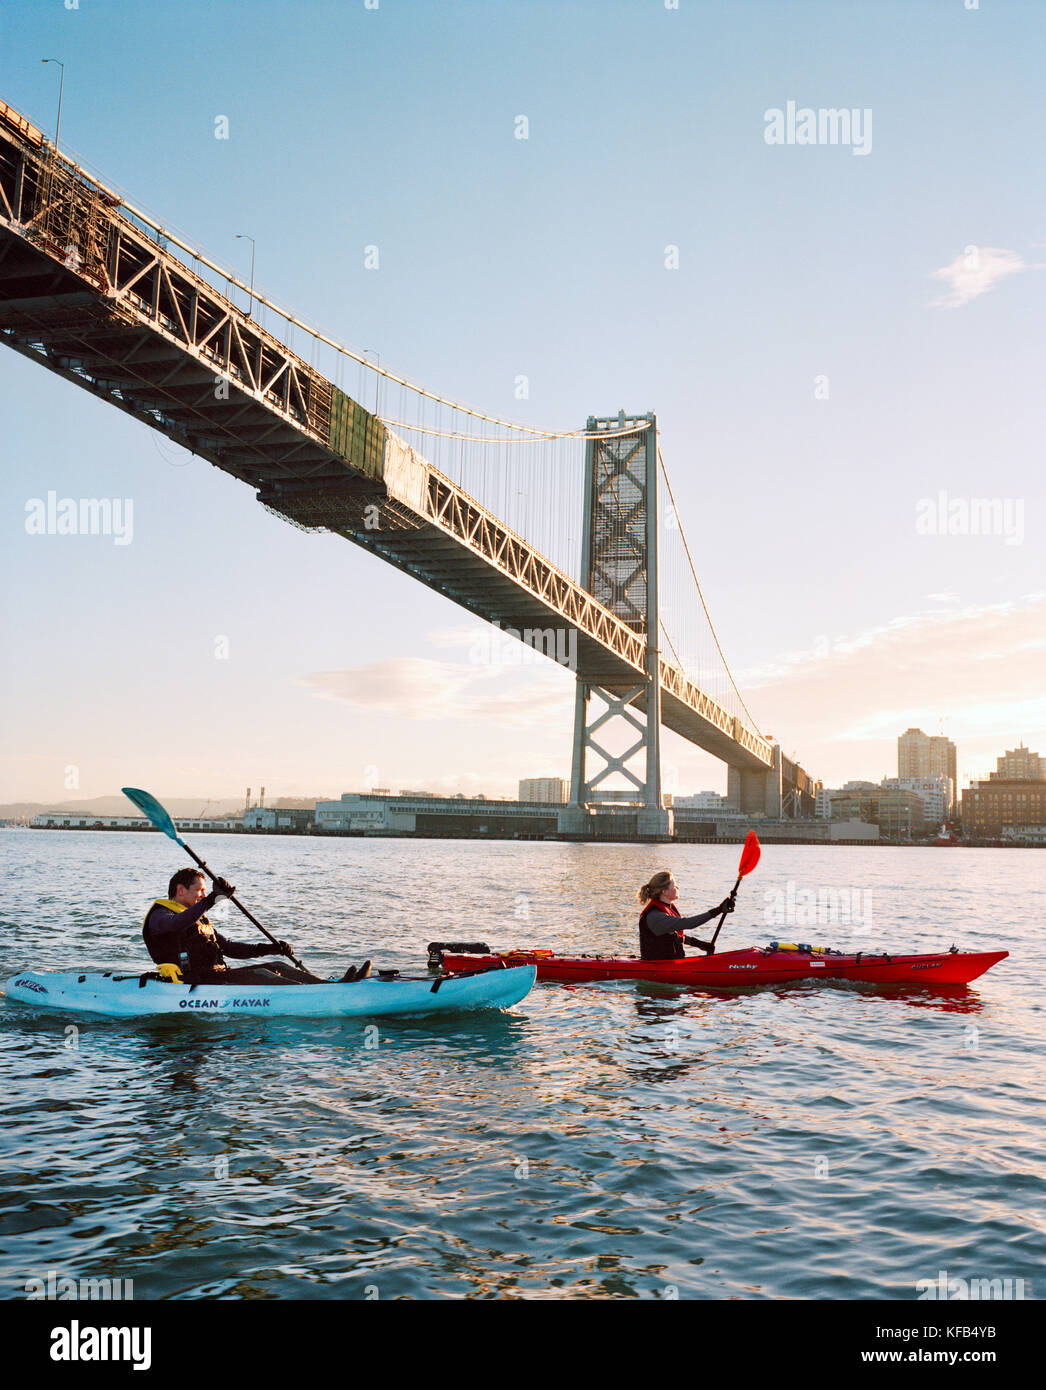 USA, California, San Francisco, a man and woman kayak in the San Francisco Bay under the Bay Bridge, the city of - Stock Image